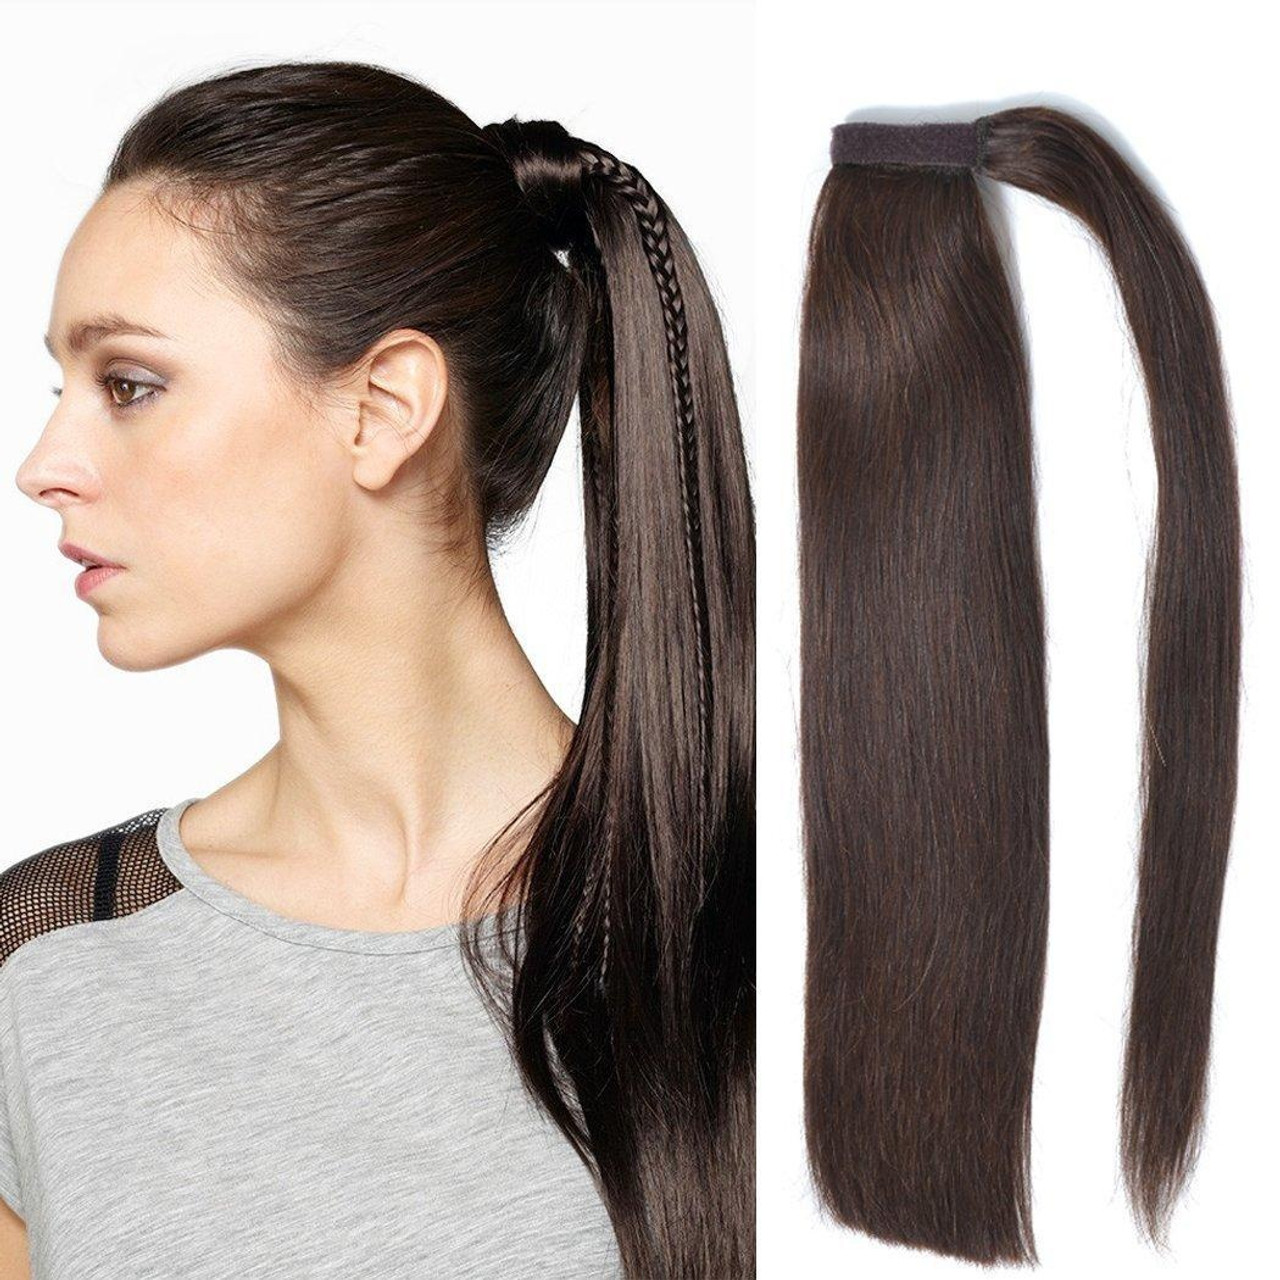 Remeehi 100 Real Human Hair Body Wave Wrap Around